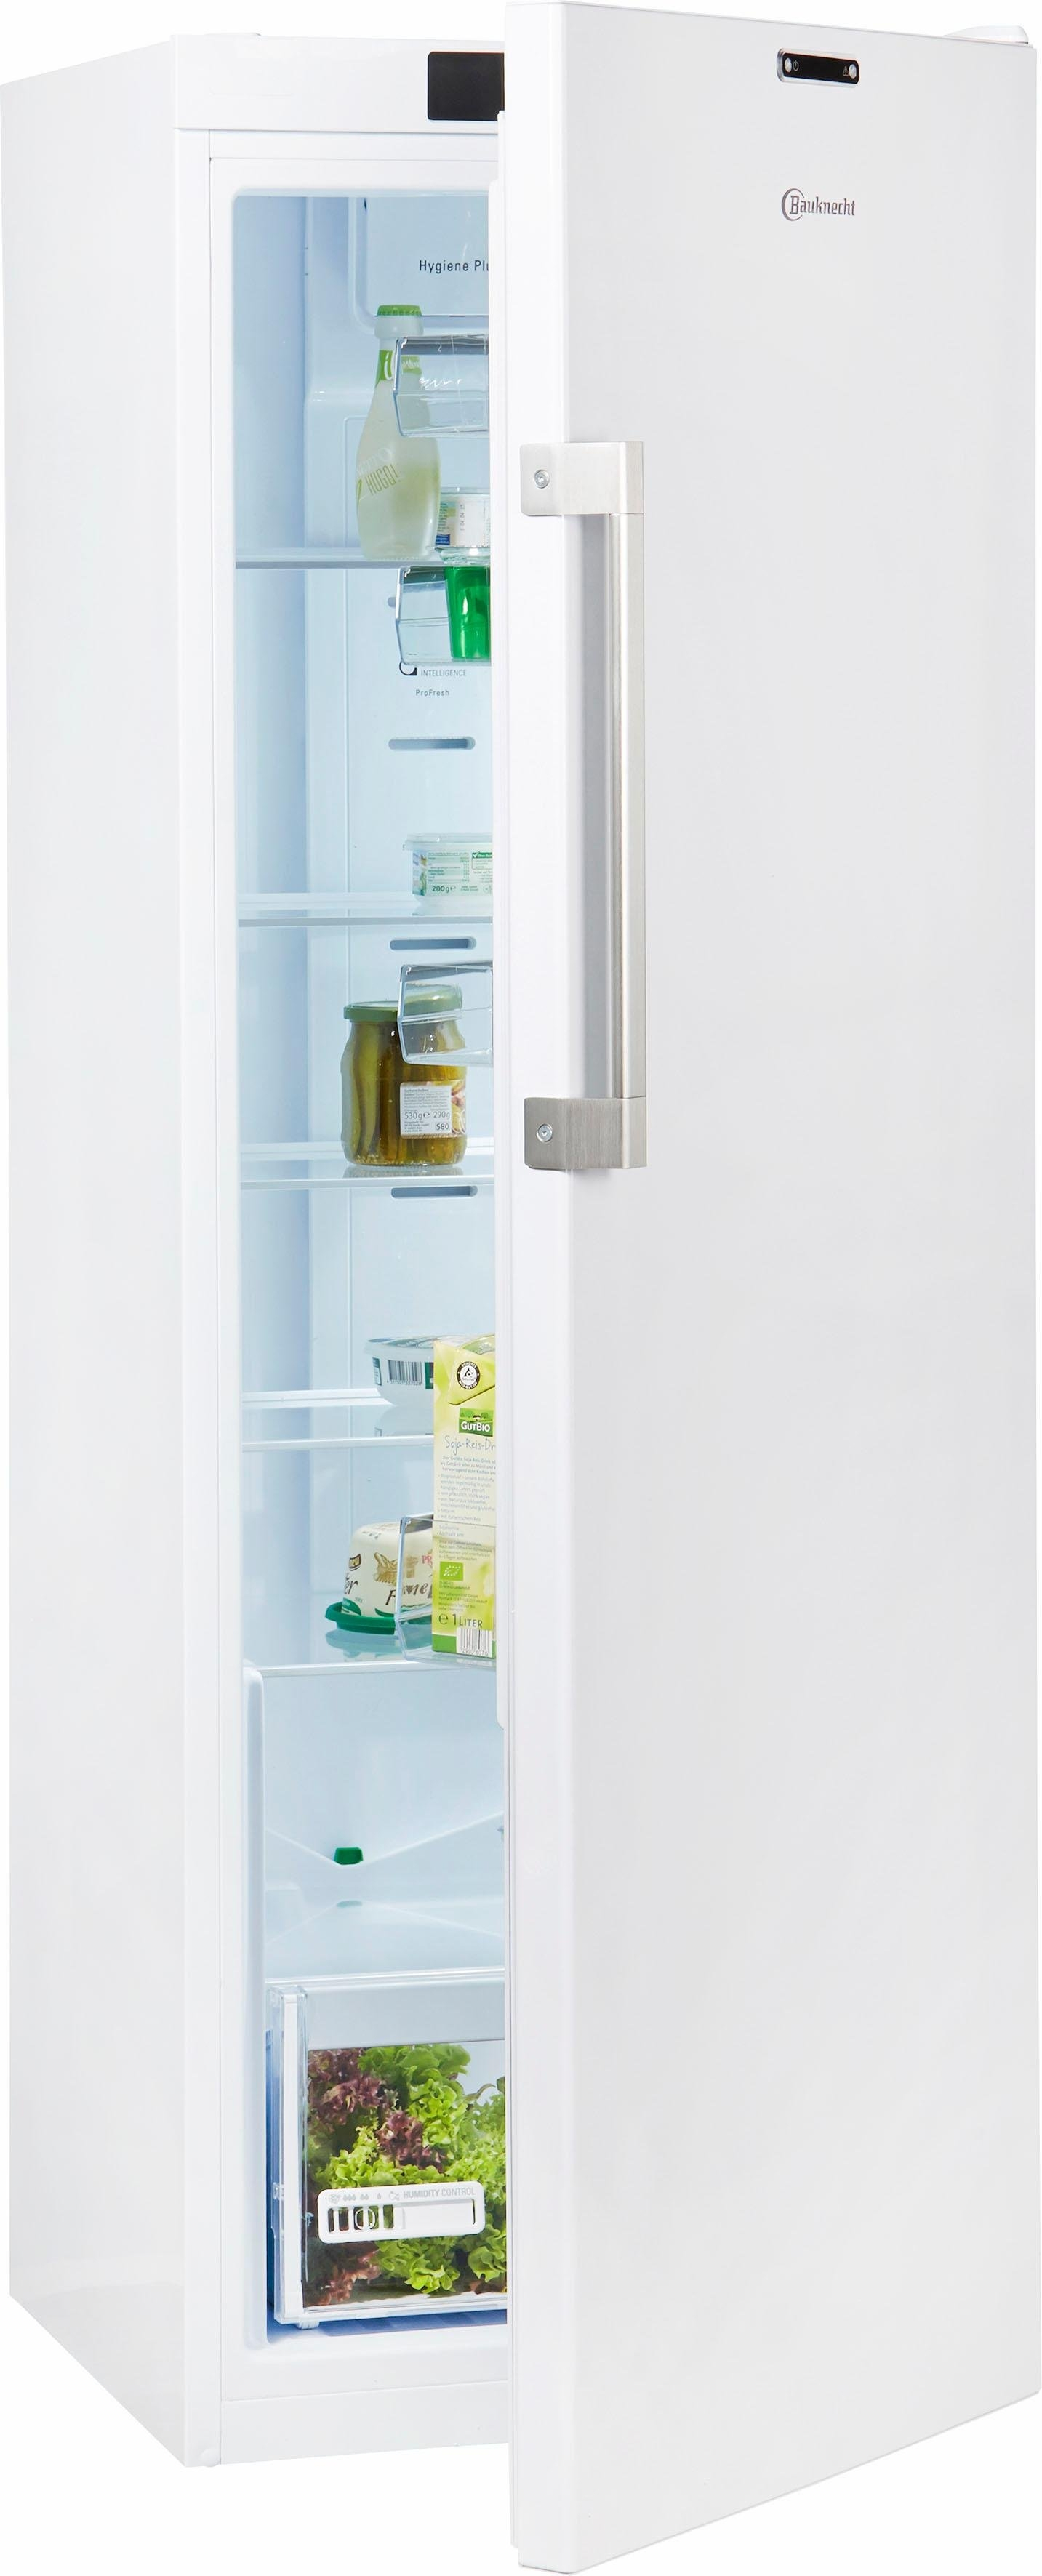 Bauknecht koelkast KR 17G4 A2+ WS, energieklasse A++, 167 cm hoog, ProFresh - verschillende betaalmethodes